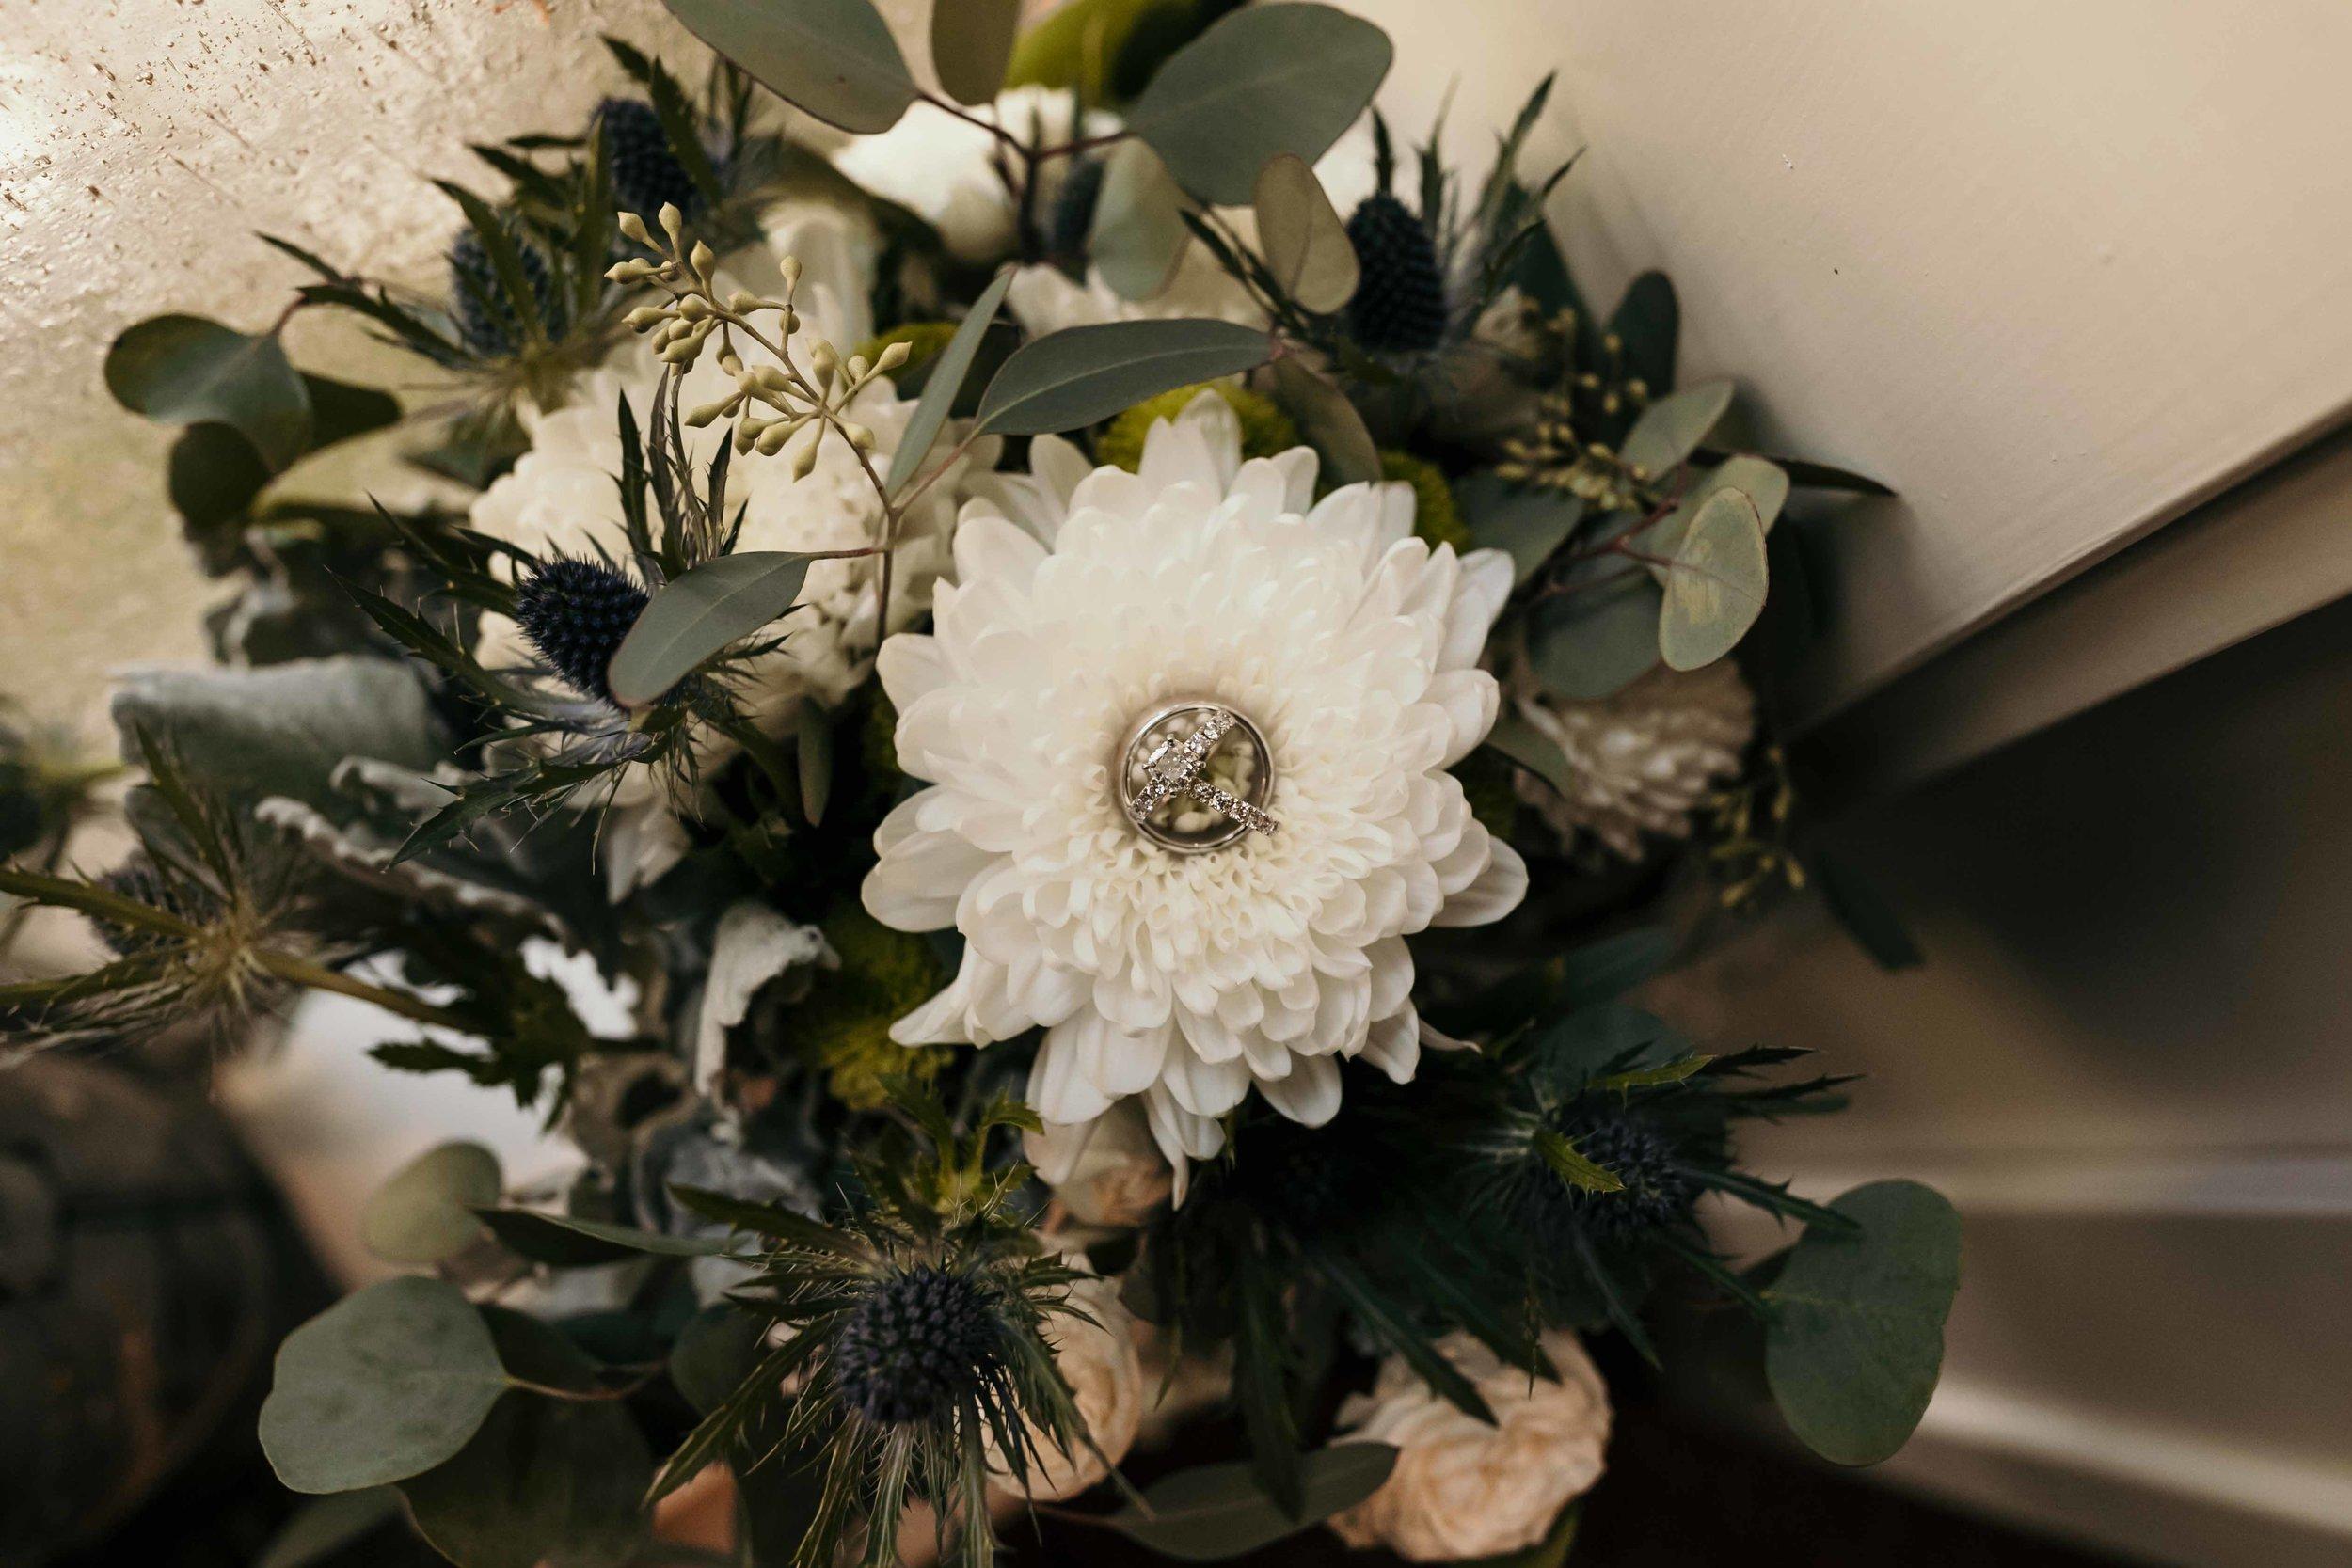 kilworth-memorial-chapel-wedding-9.jpg